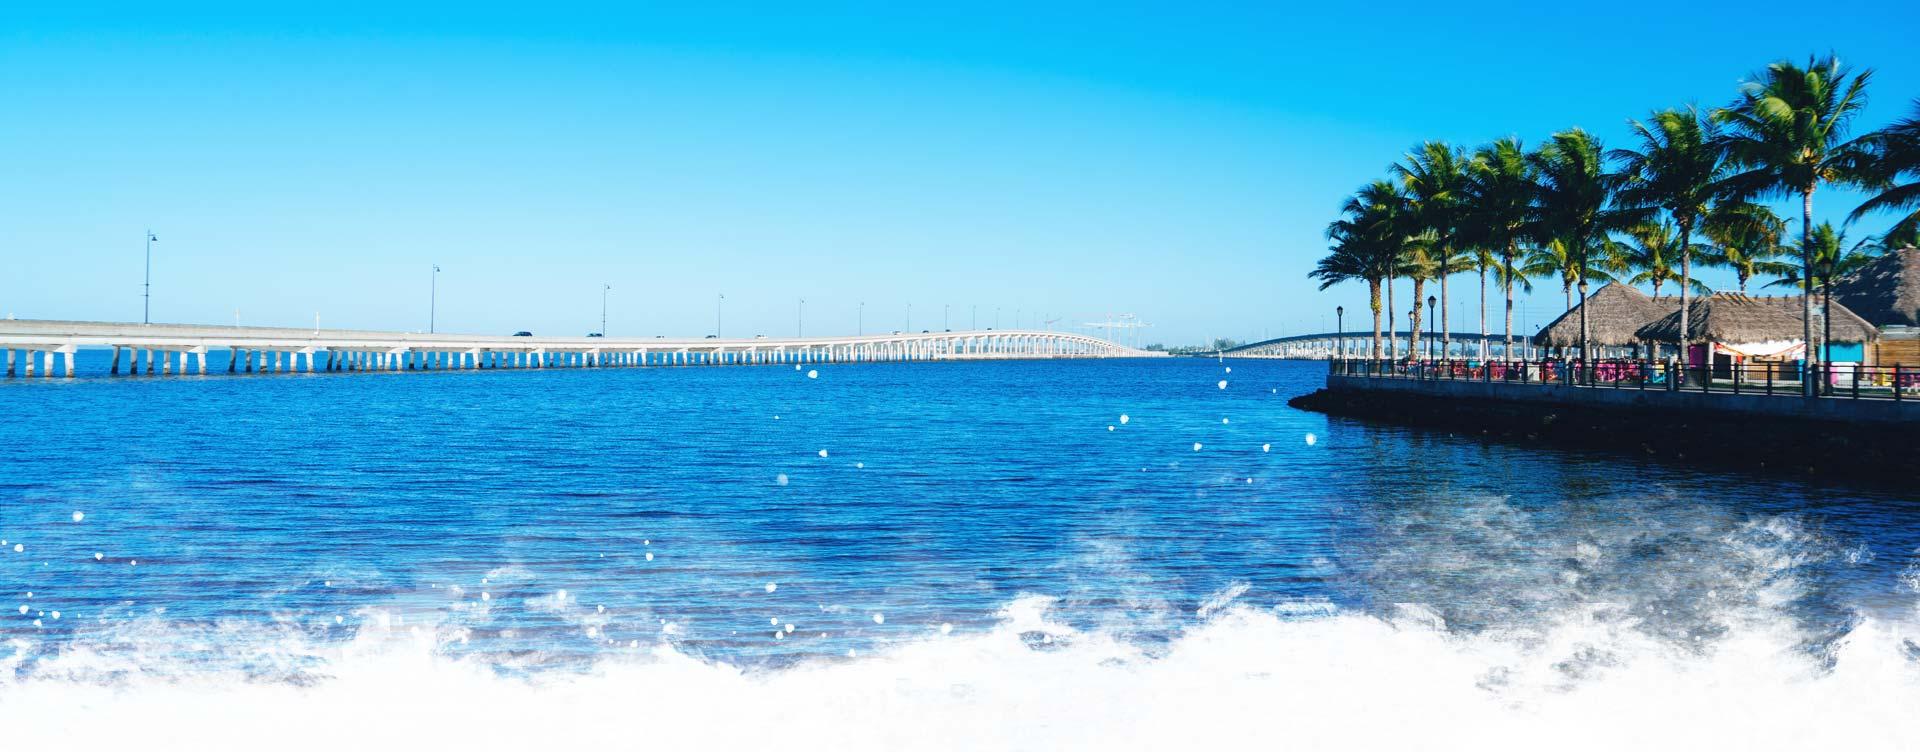 Charlotte Harbor Background Image